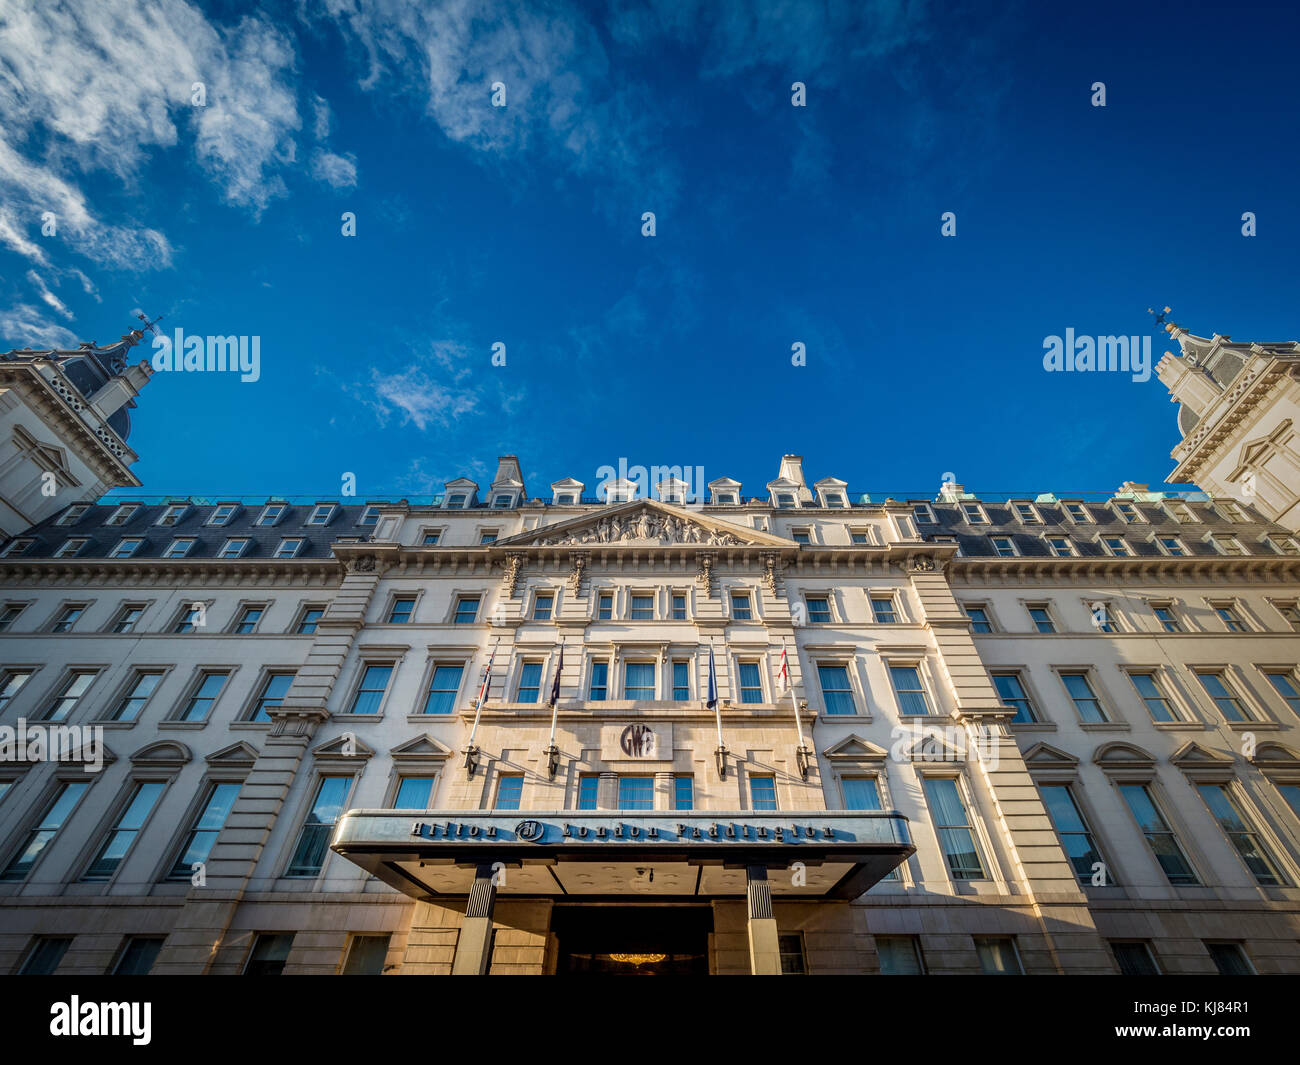 Hilton London Paddington Hotel, UK - Stock Image